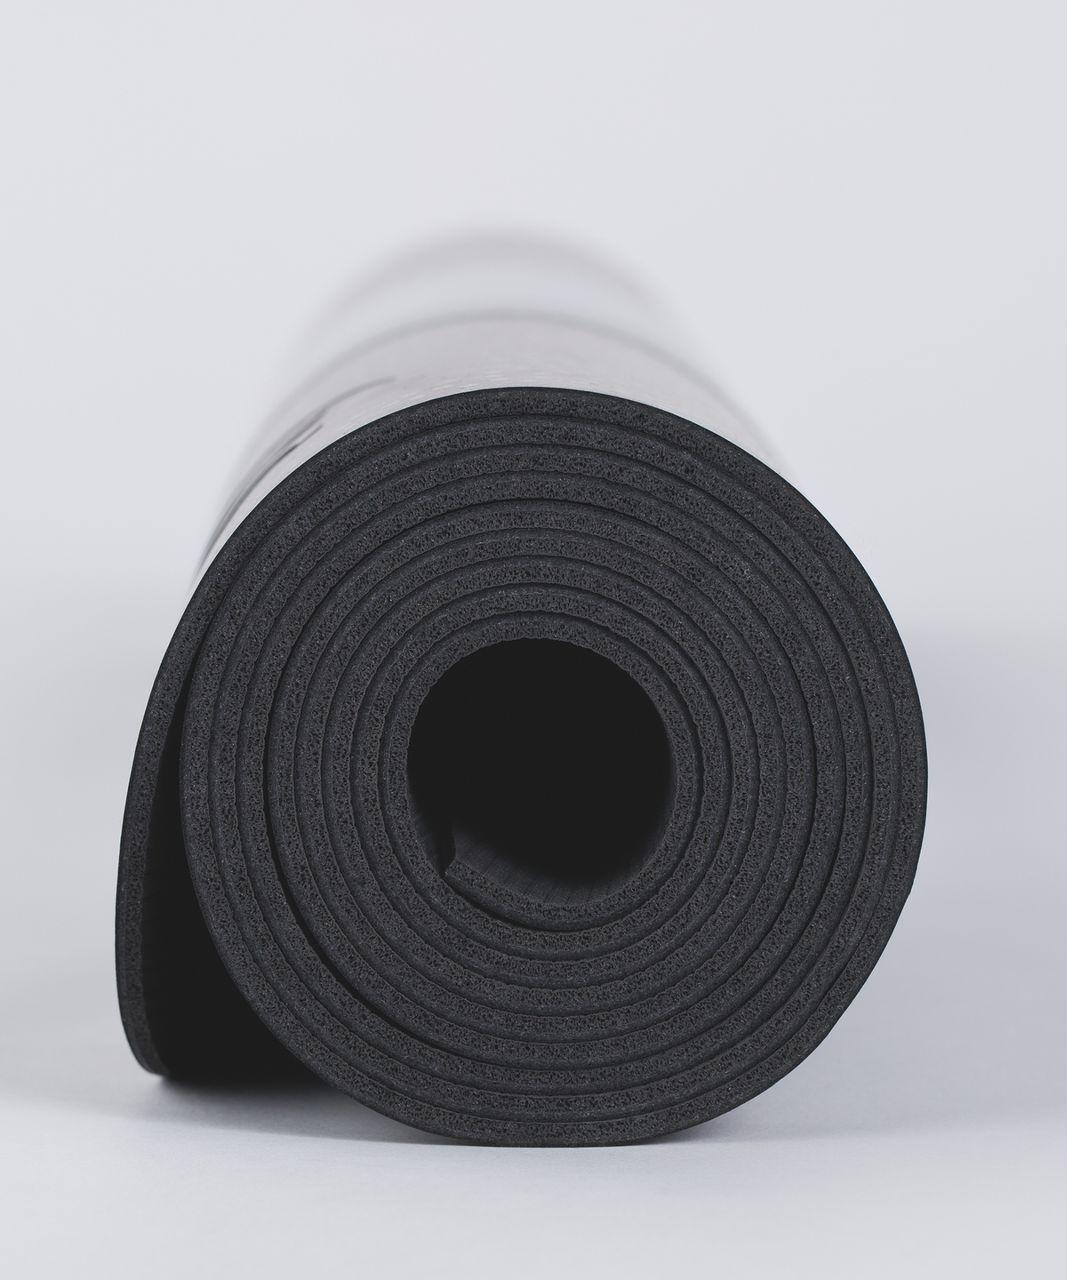 Lululemon The Reversible Mat 3mm - Frozen Fizz Ice Grey Black / Black